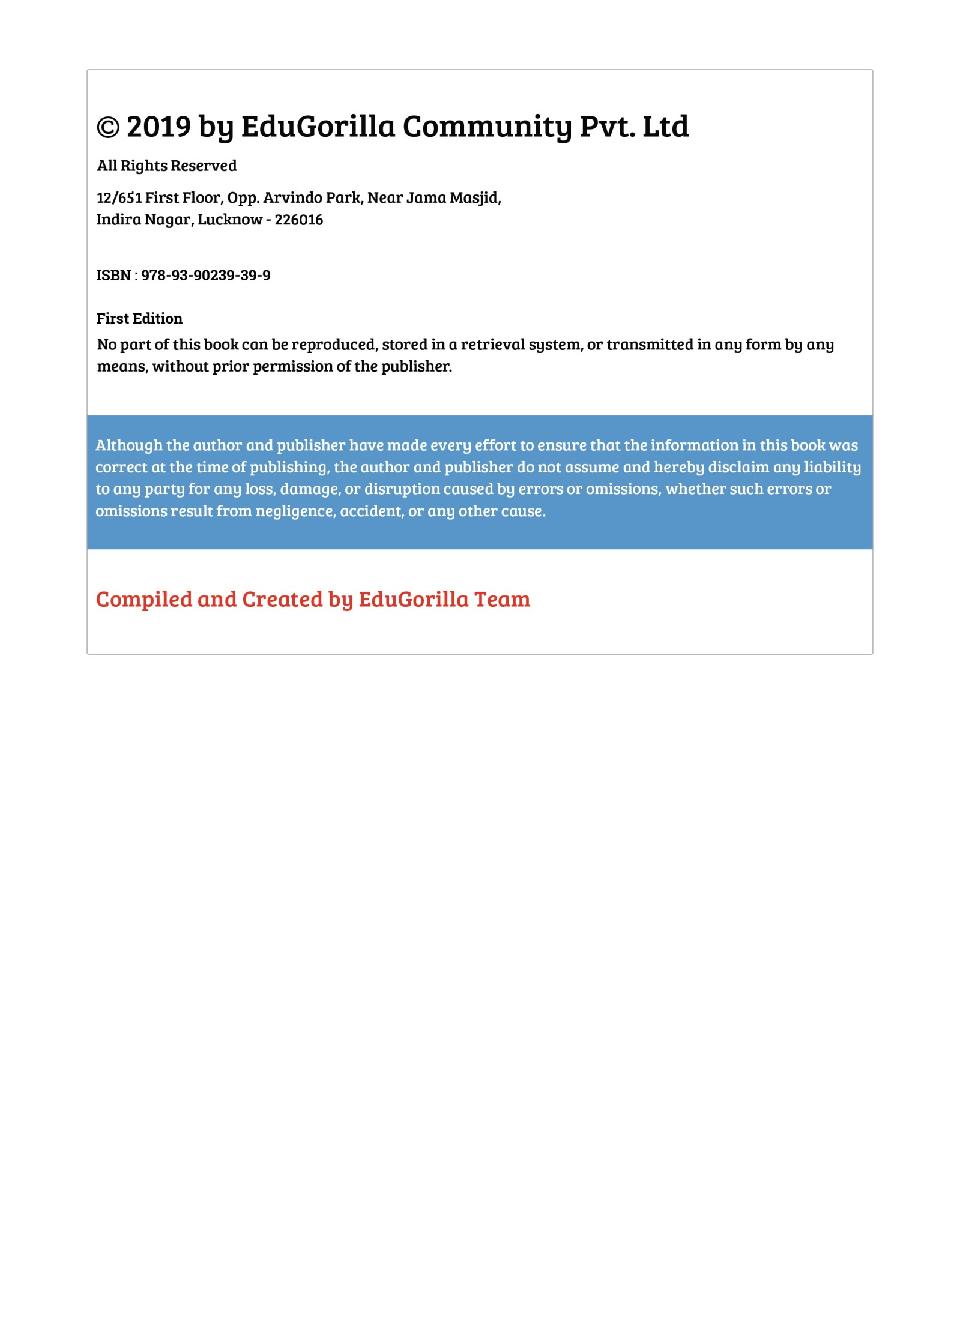 EduGorilla LIC Assistant Prelims & Mains Exam 2020 | 20 Mock Test - Page 4